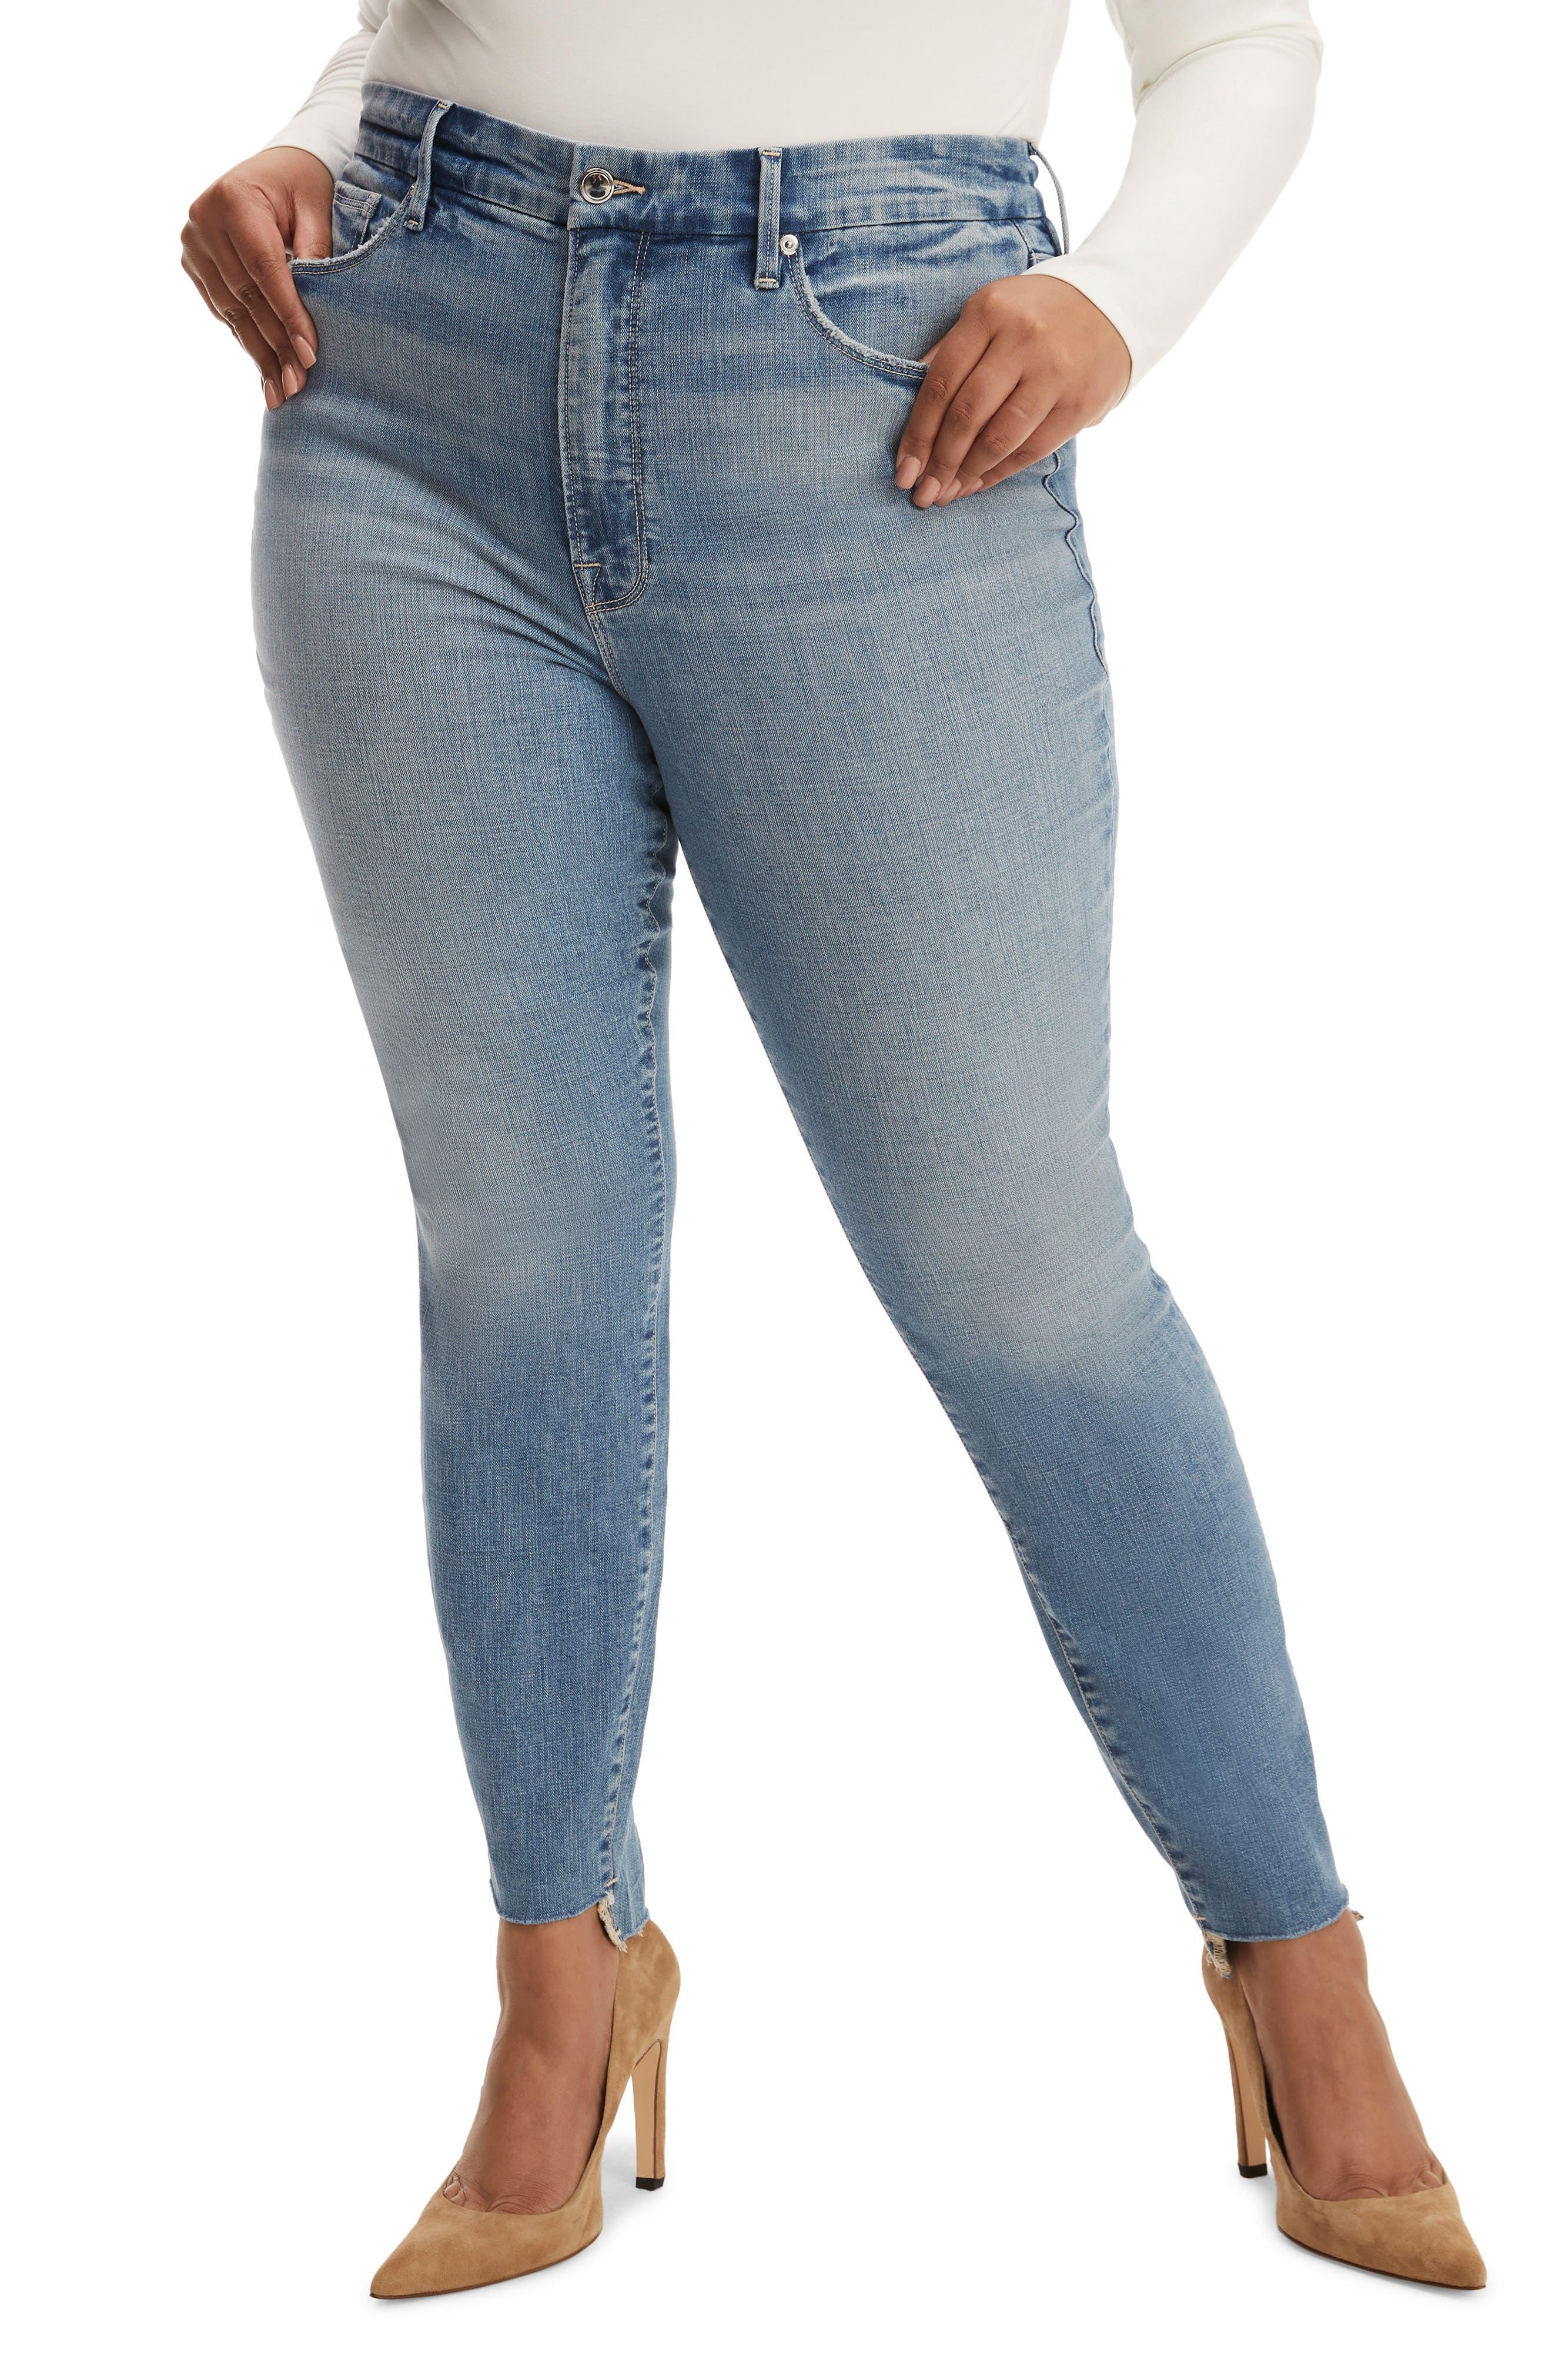 Women's Good American Good Legs Raw Step Hem Skinny Jeans